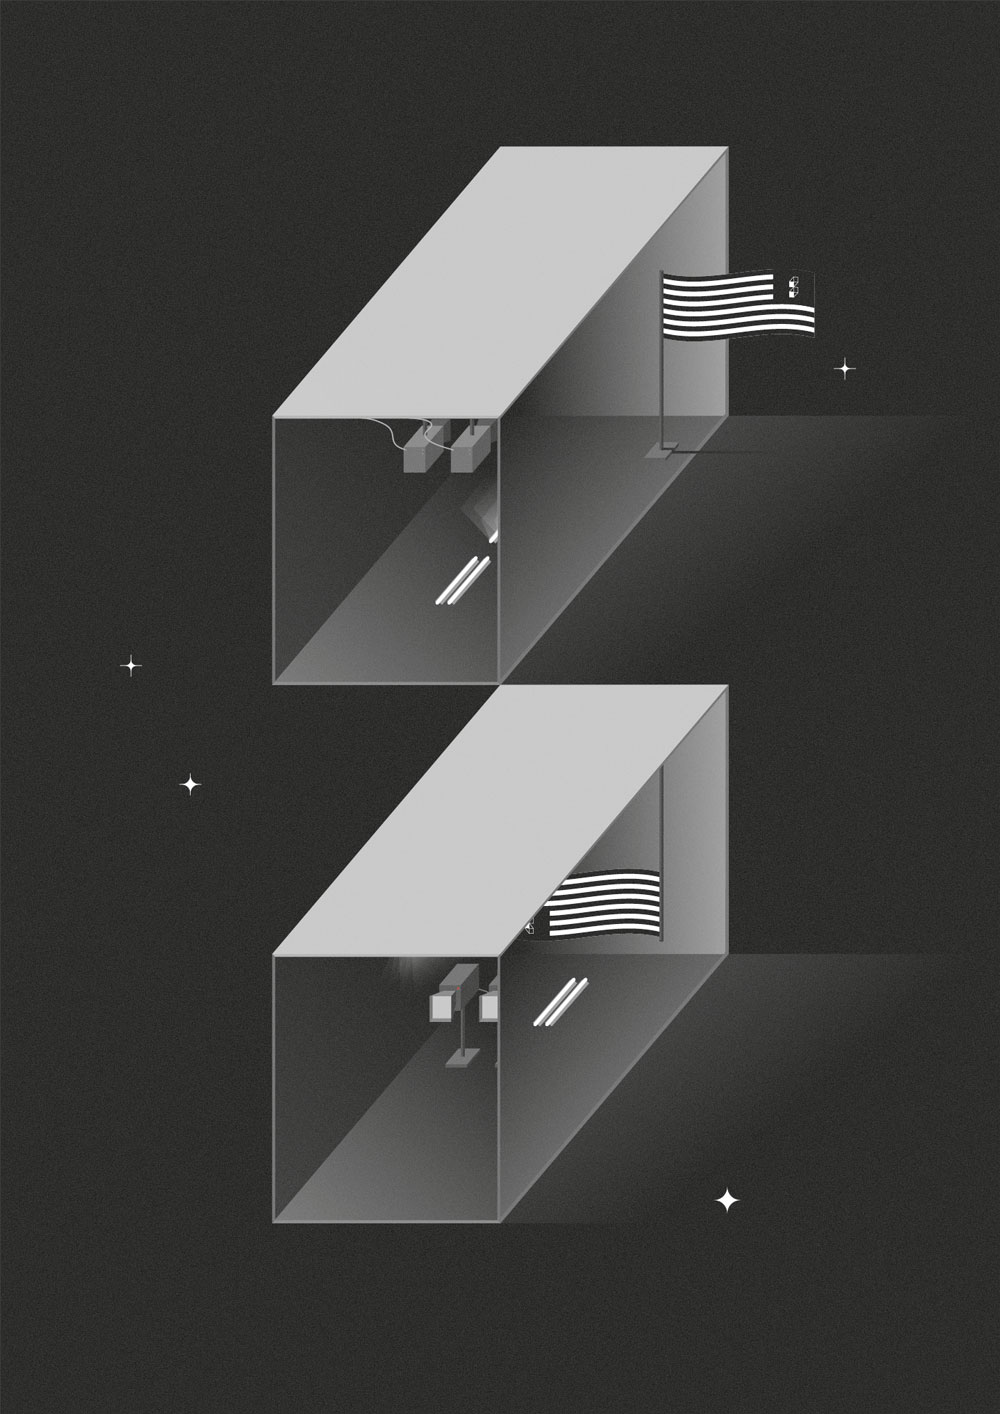 zr-space2